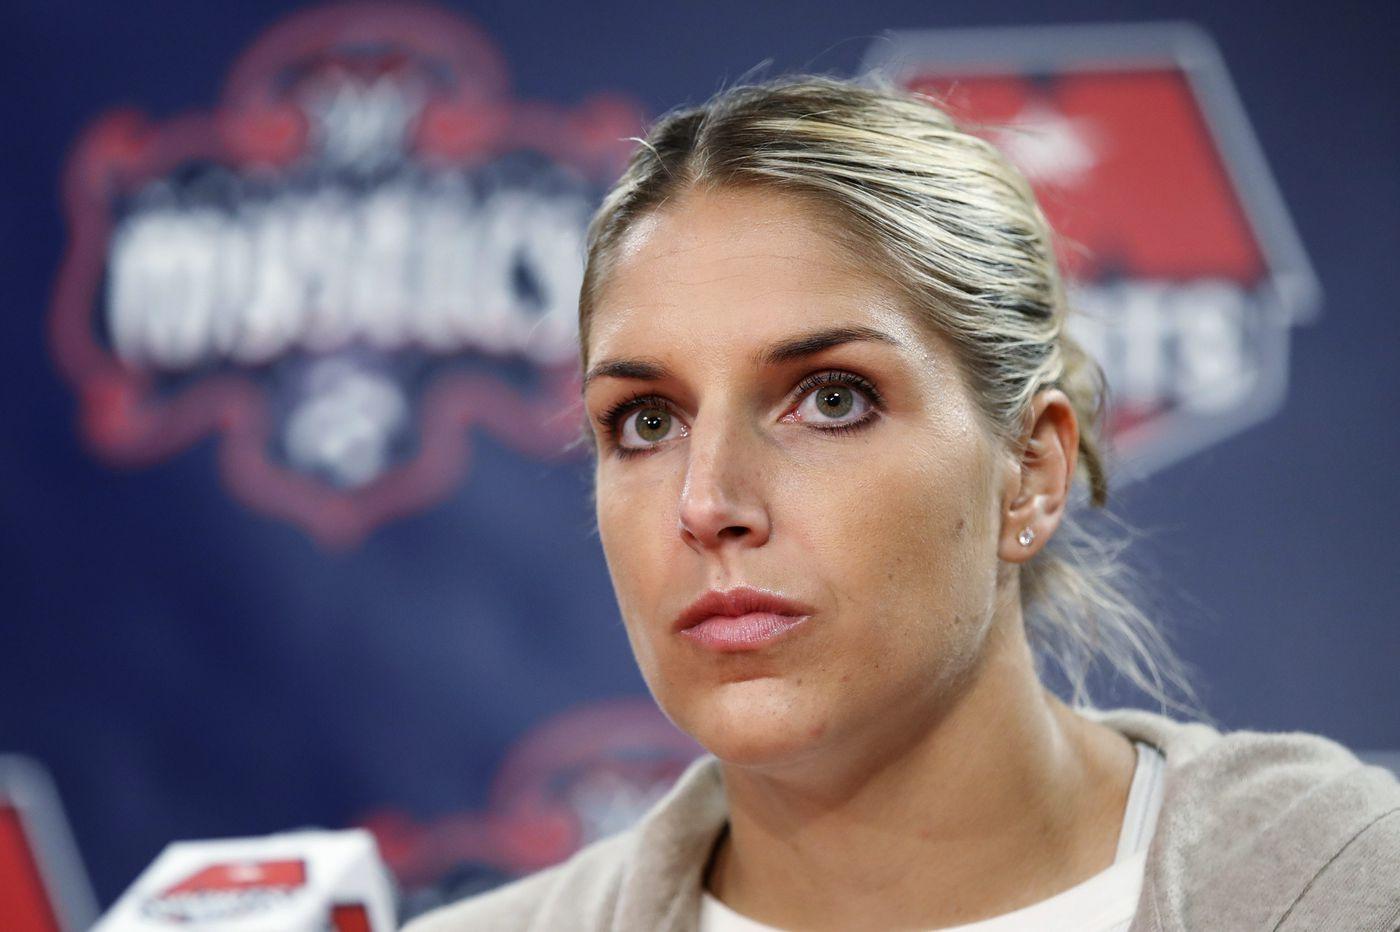 Elena Delle Donne, now a WNBA vet, is ready to make herself heard